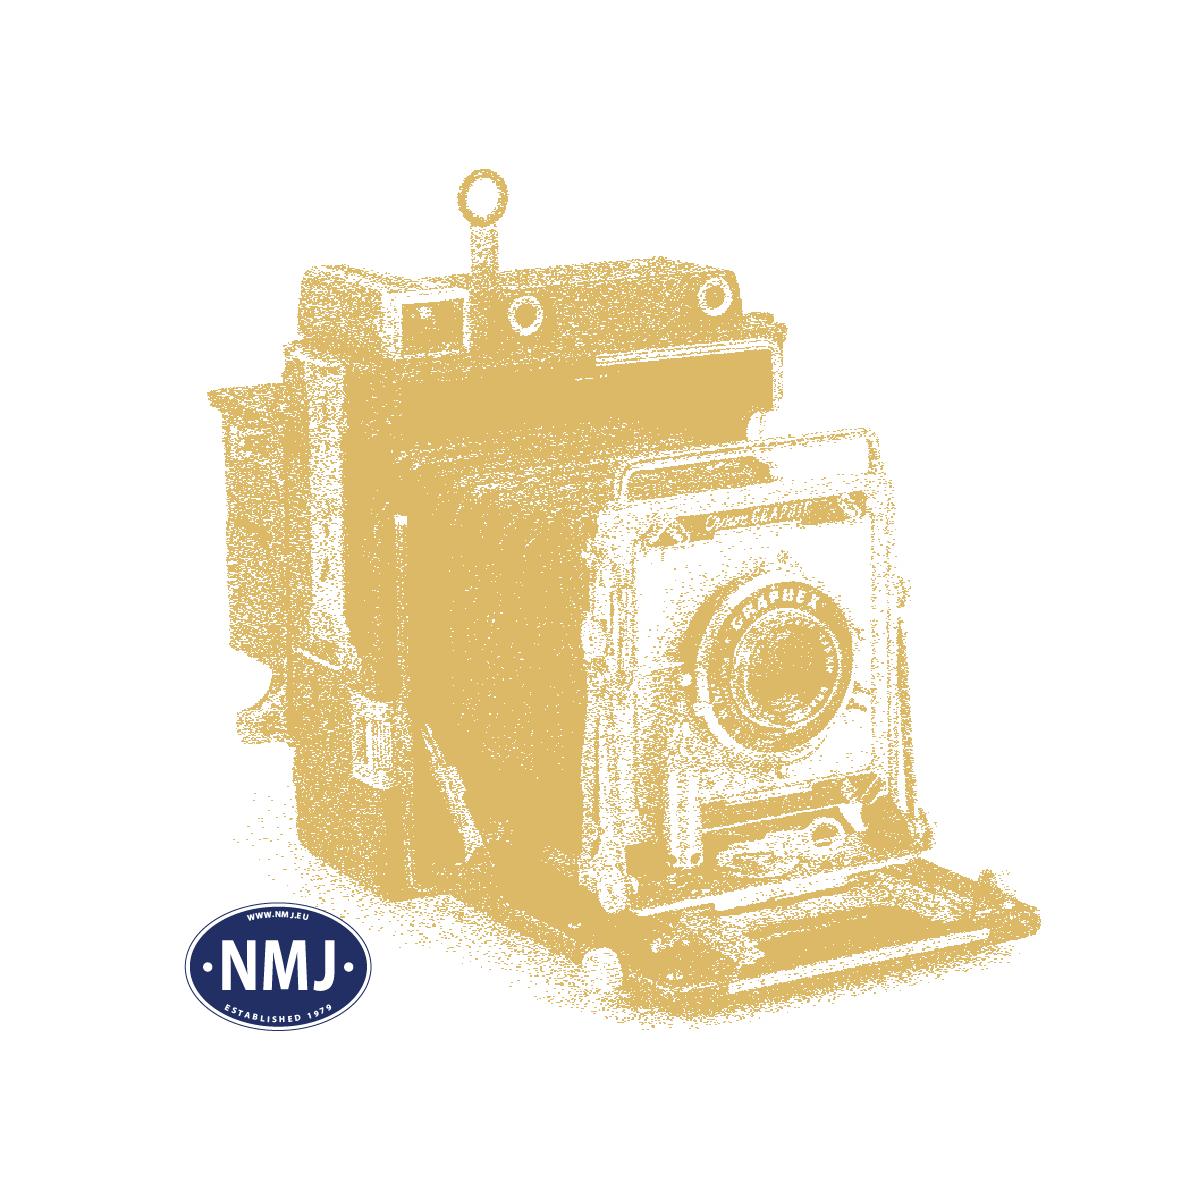 NMJT90404 - NMJ Topline SNCB 5407, DCC m/ Sound